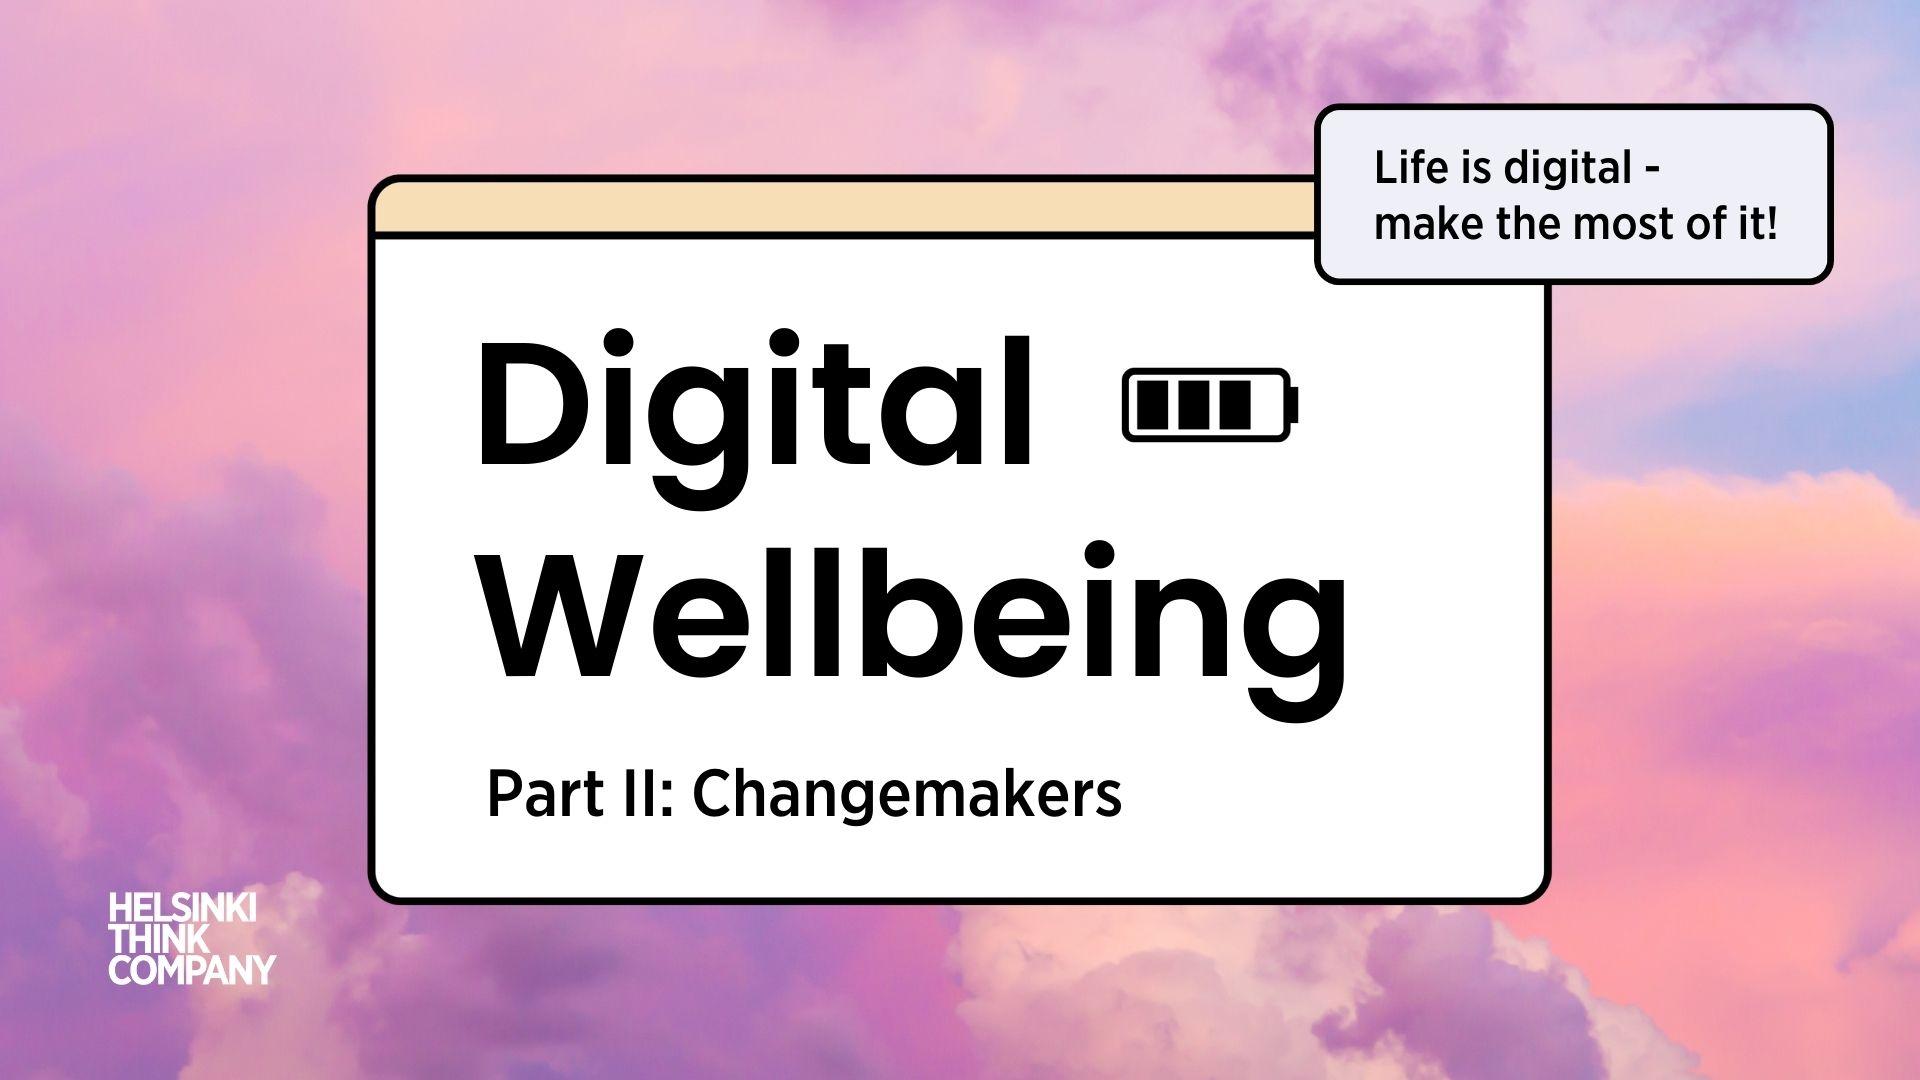 Digital wellbeing event part 2